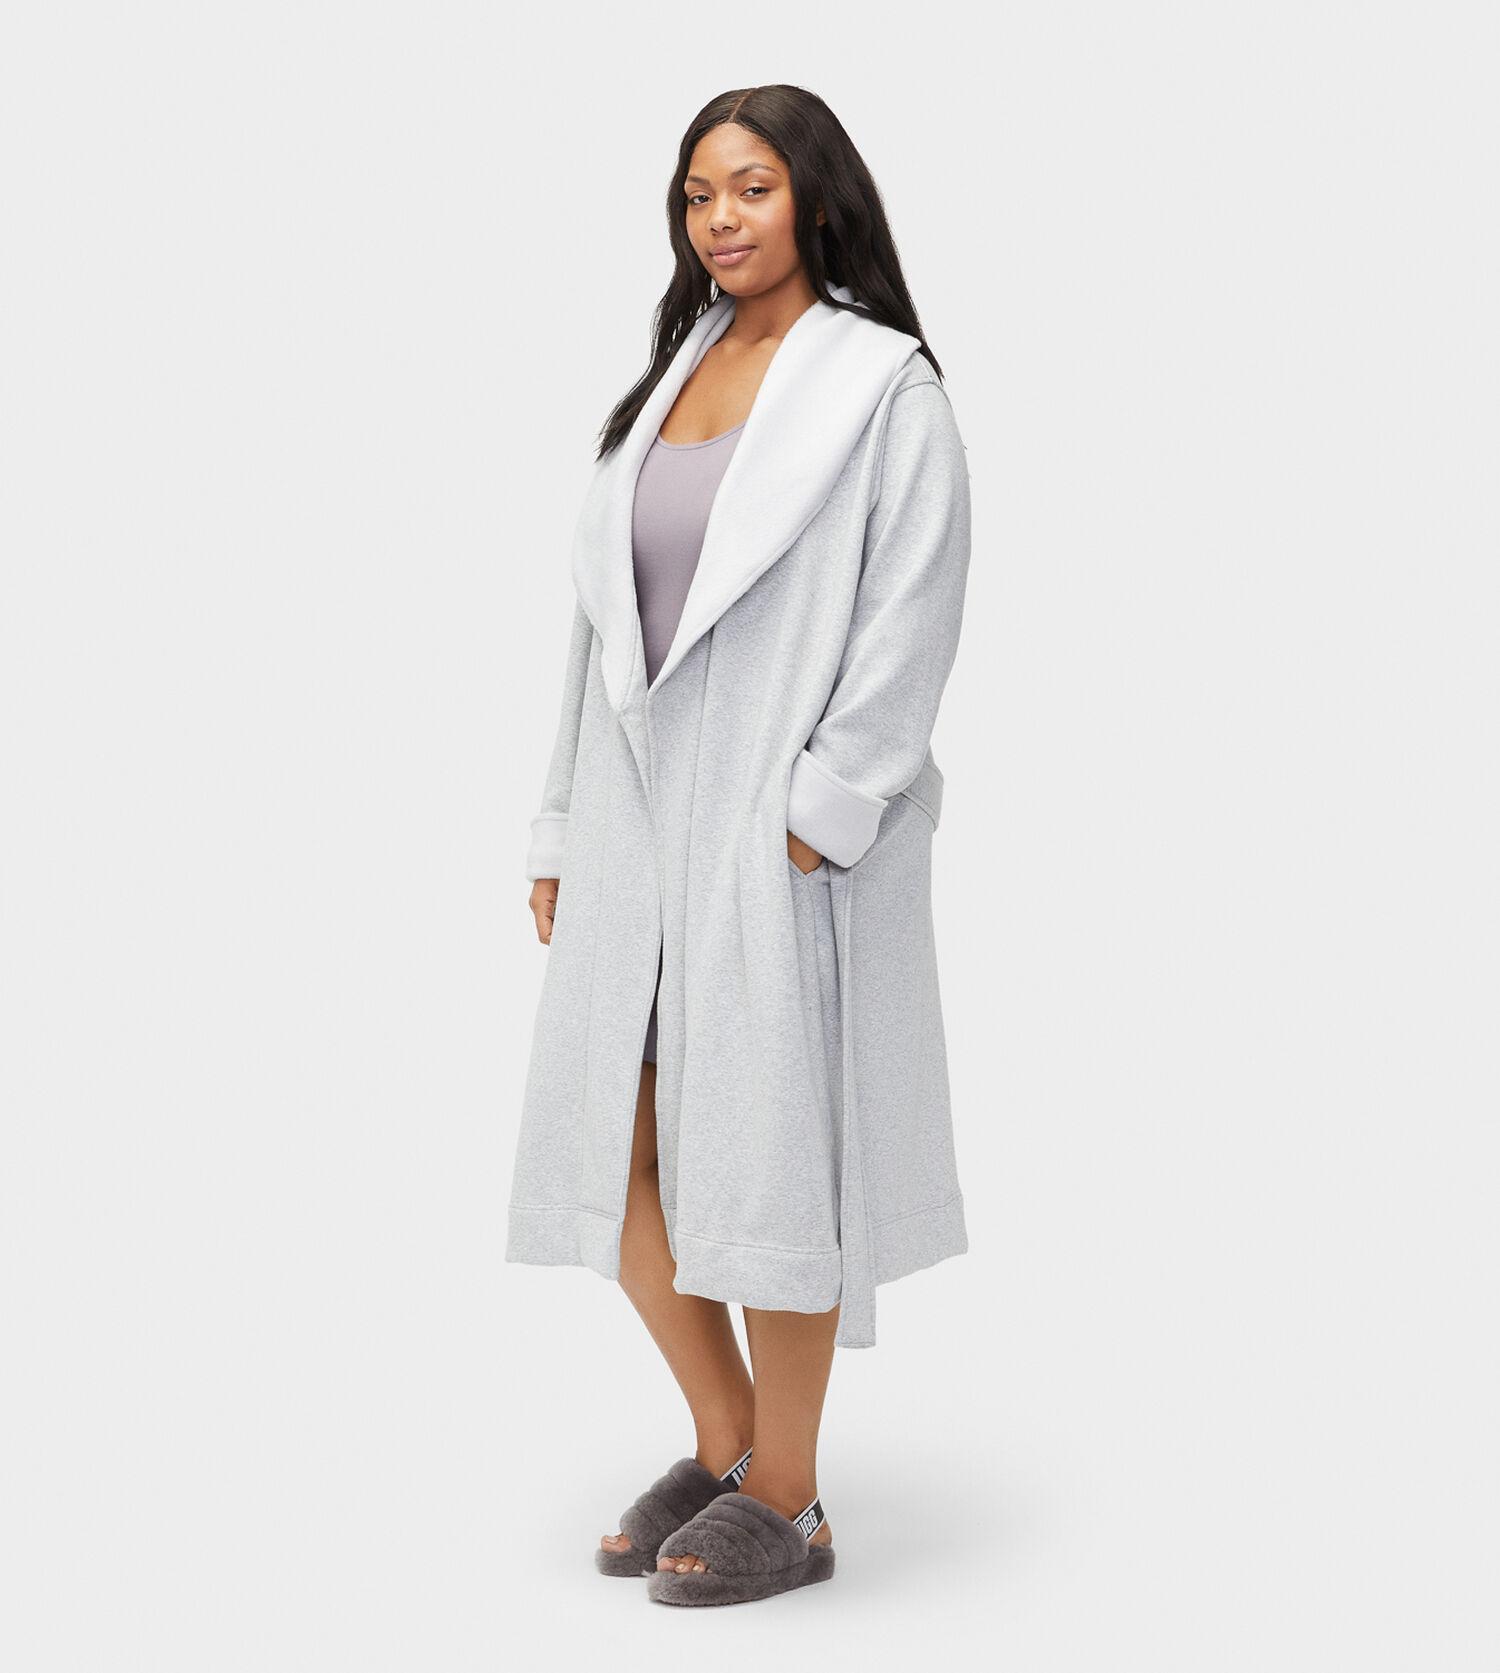 02ea63571e Duffield II Plus Robe - Ugg (US)